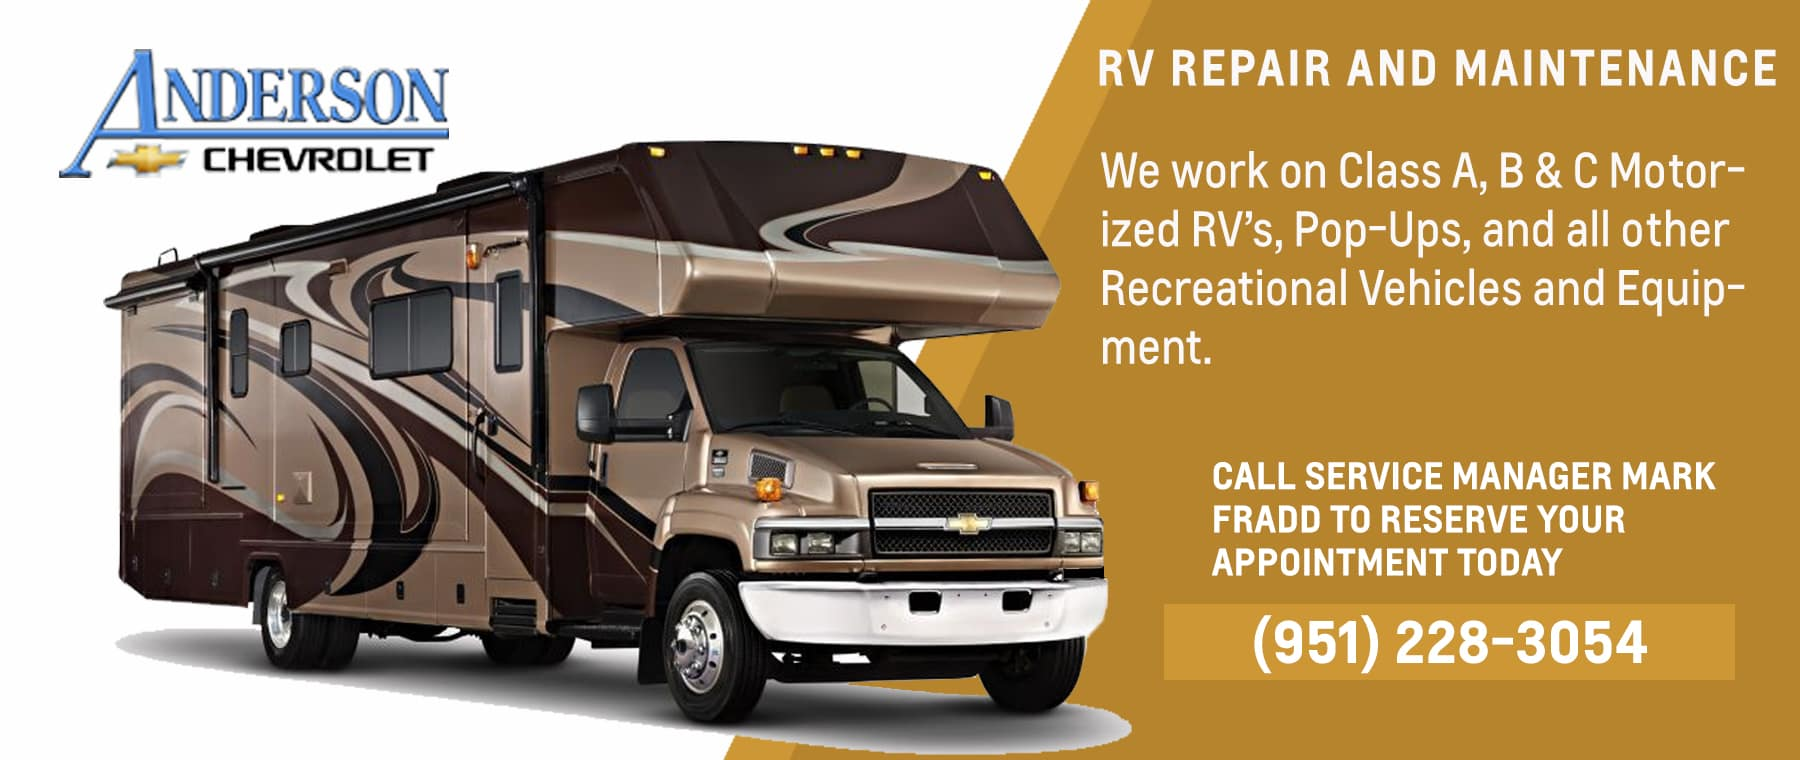 RV_SERVICE